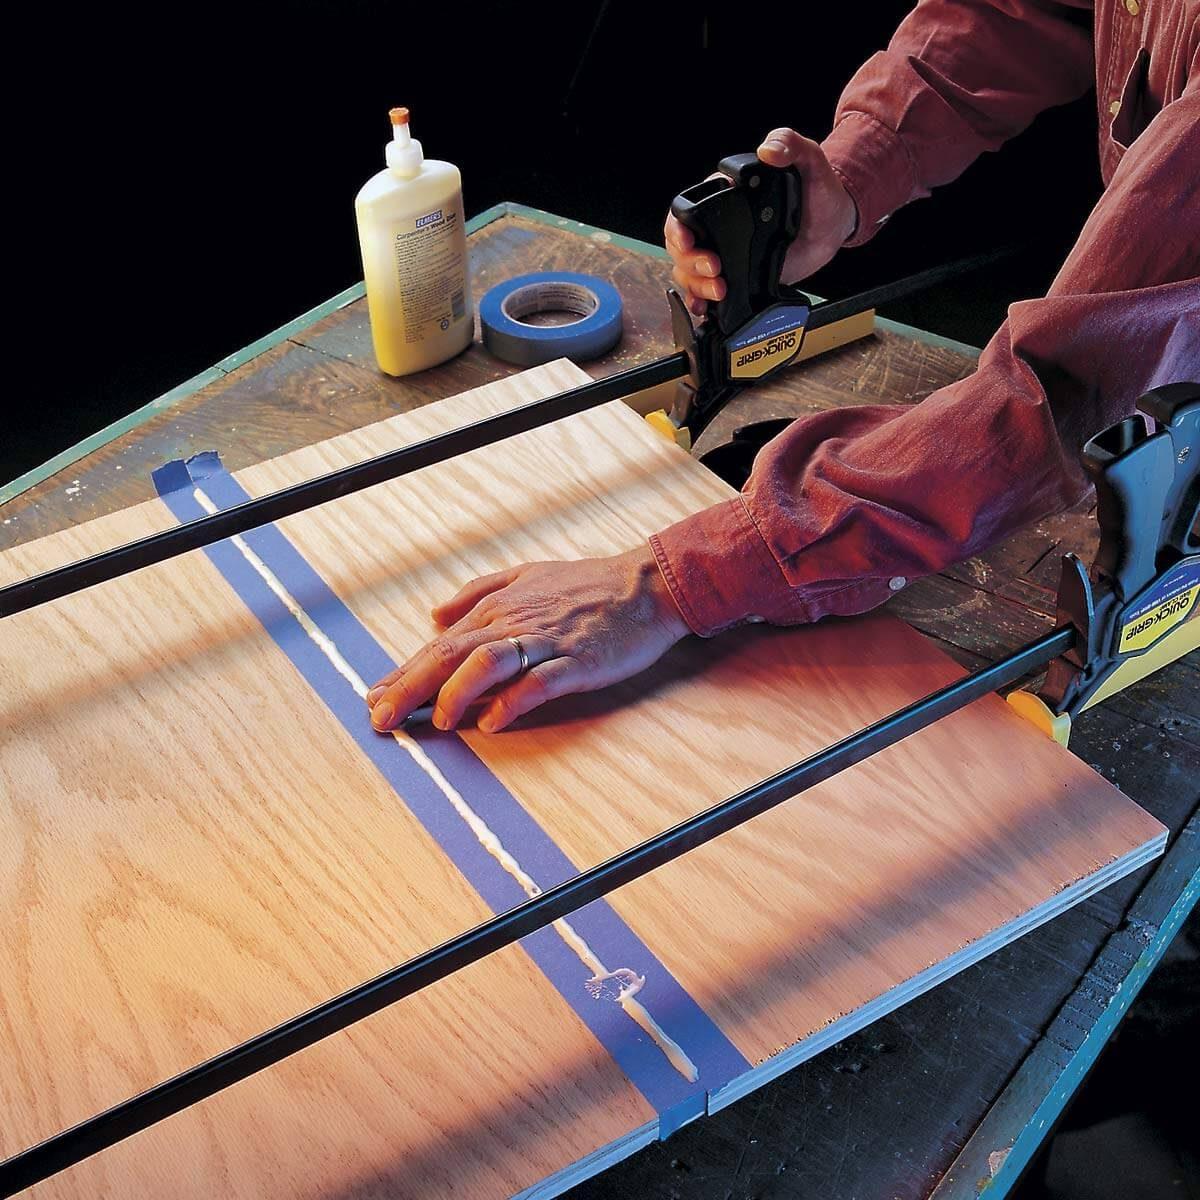 stainless edge gluing workshop tip